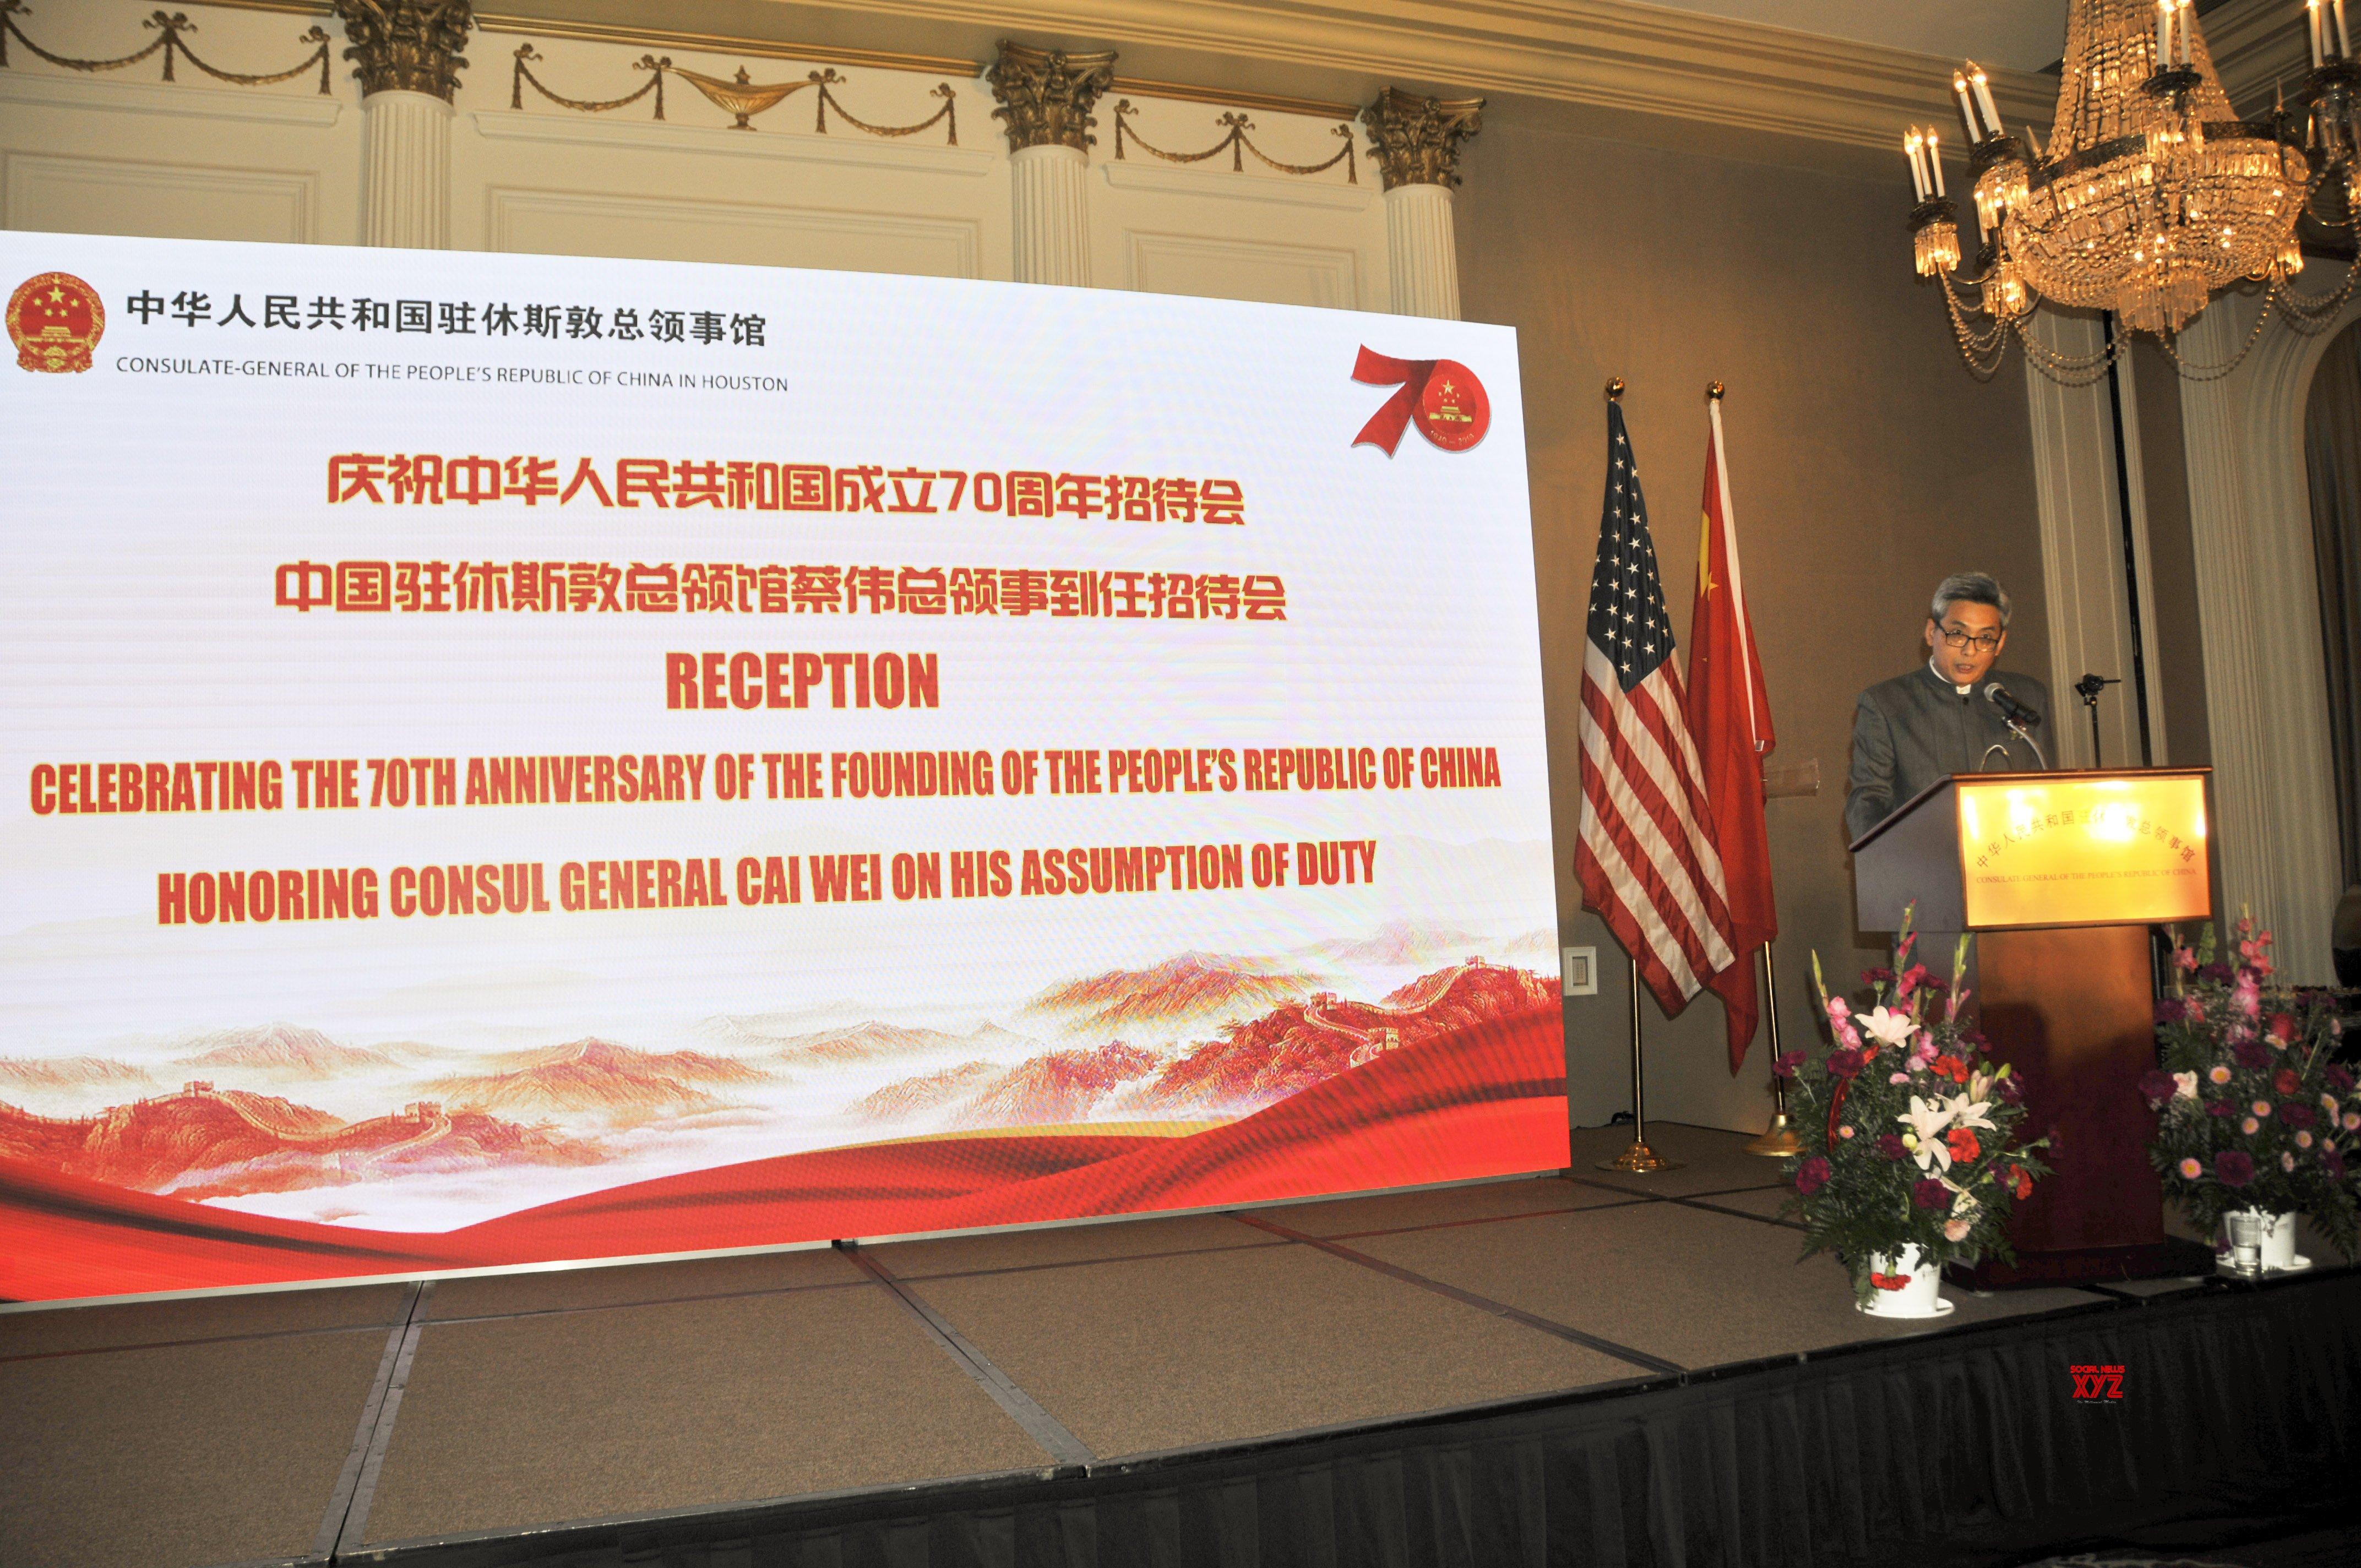 U.S. - HOUSTON - CHINA - CONSULATE GENERAL - RECEPTION #Gallery